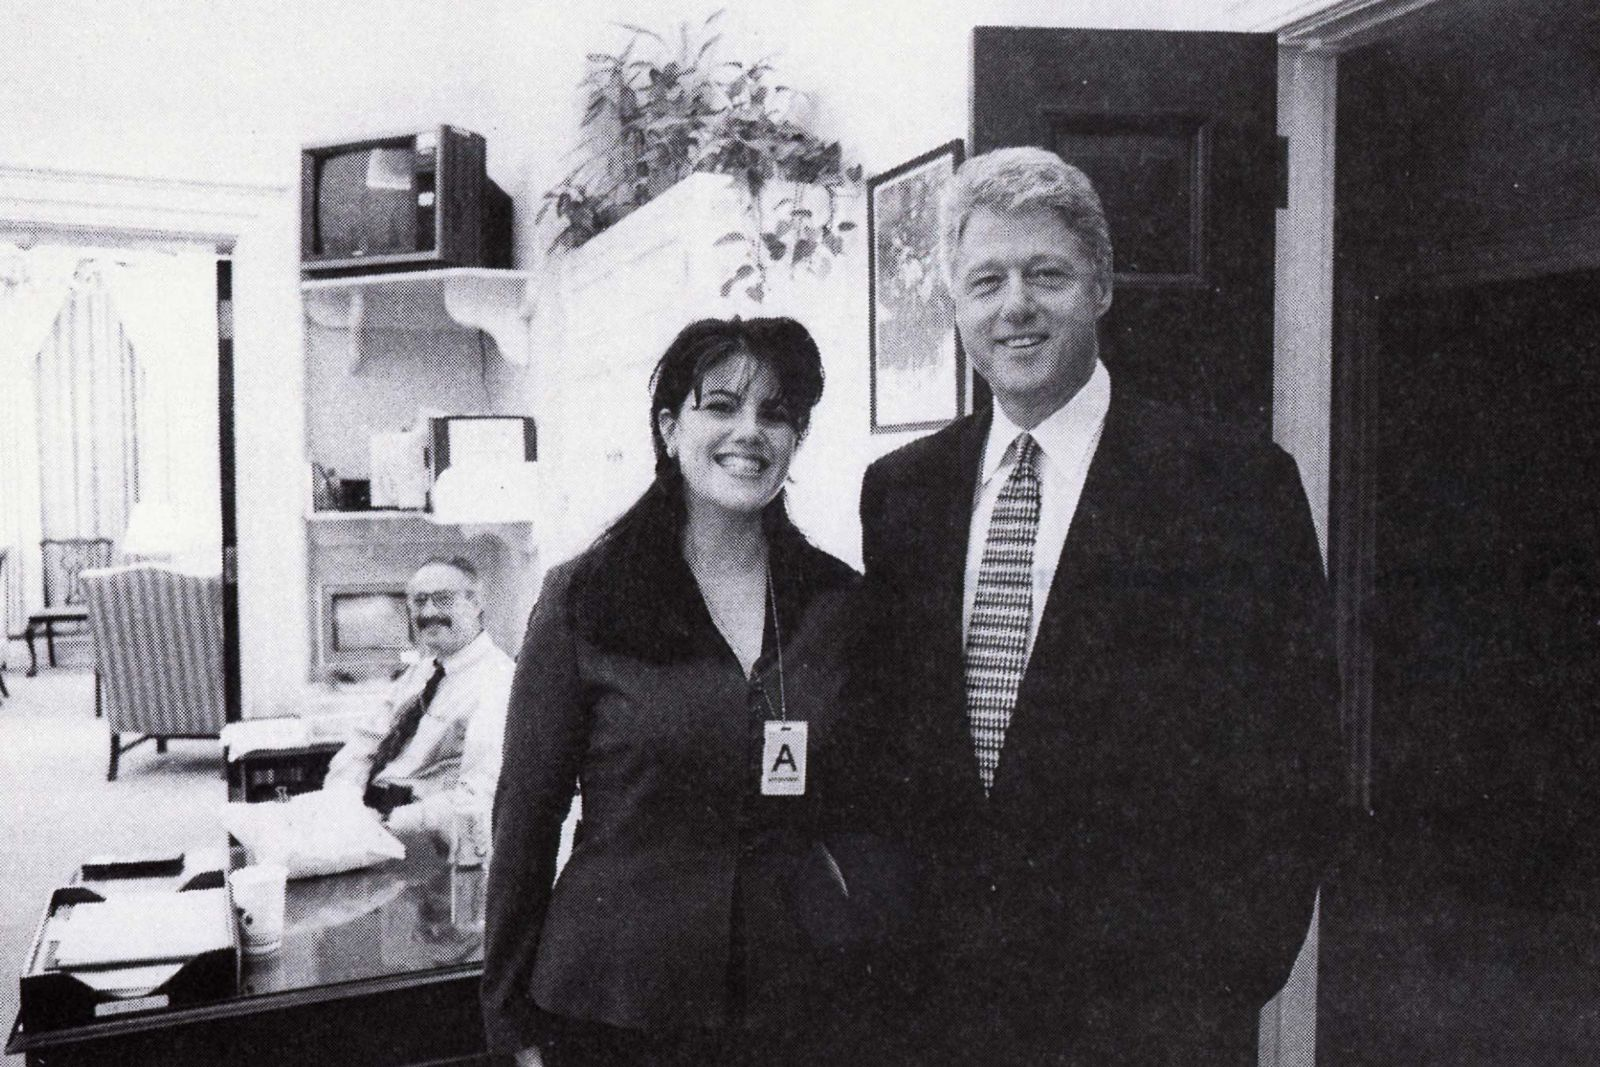 Lewinsky & Clinton